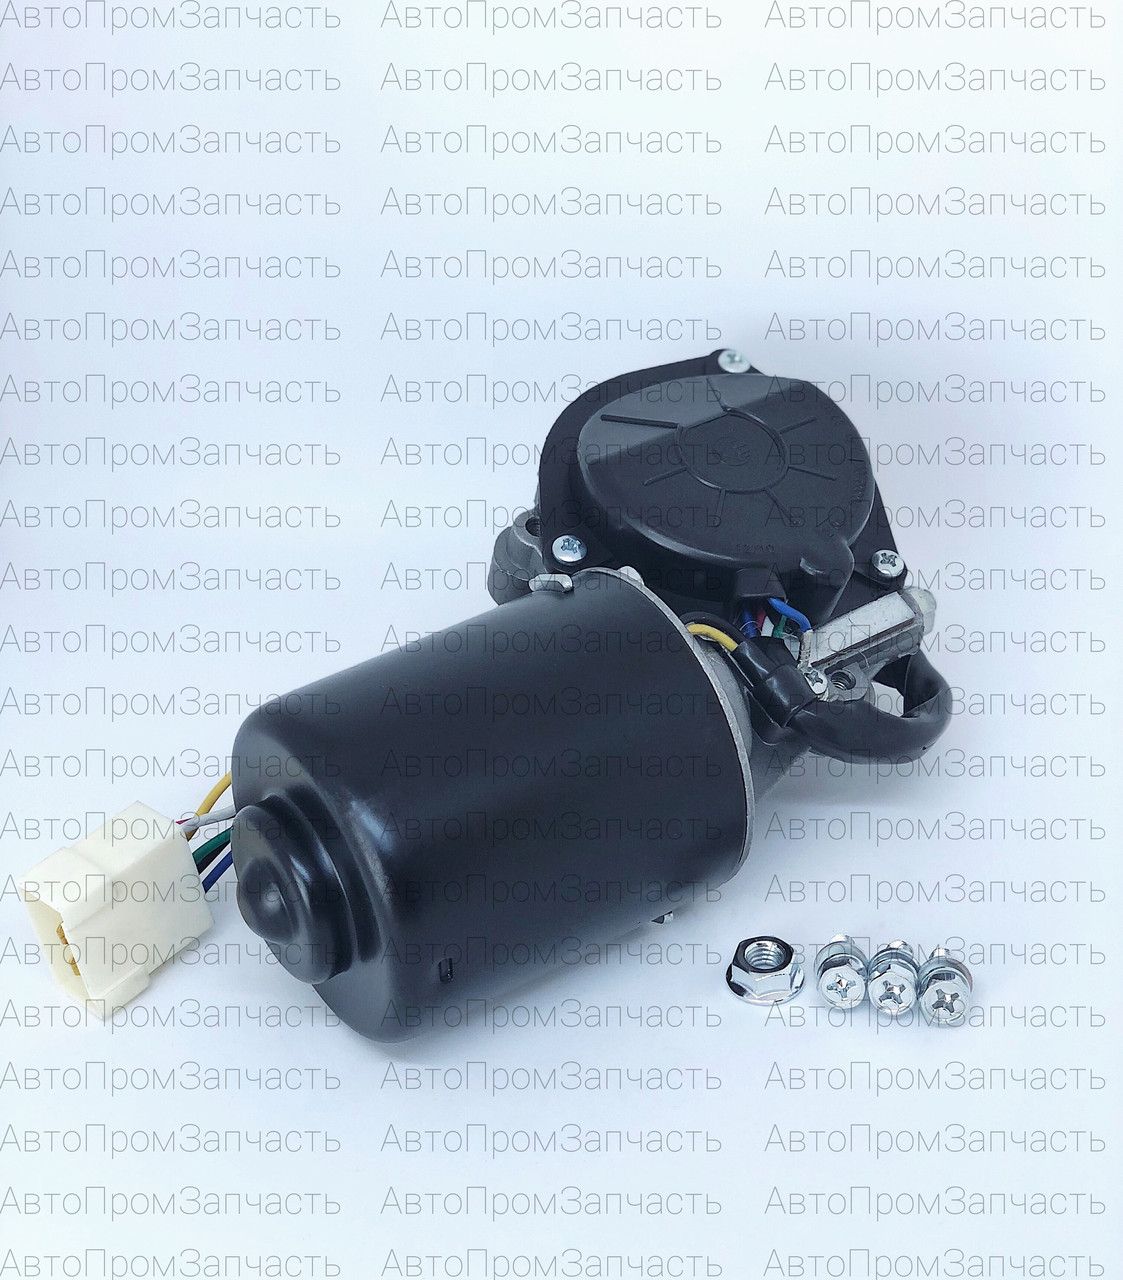 Мотор стеклоочистителя ВАЗ 2108, 2109, 21099, 2113, 2114, 2115 Калуга